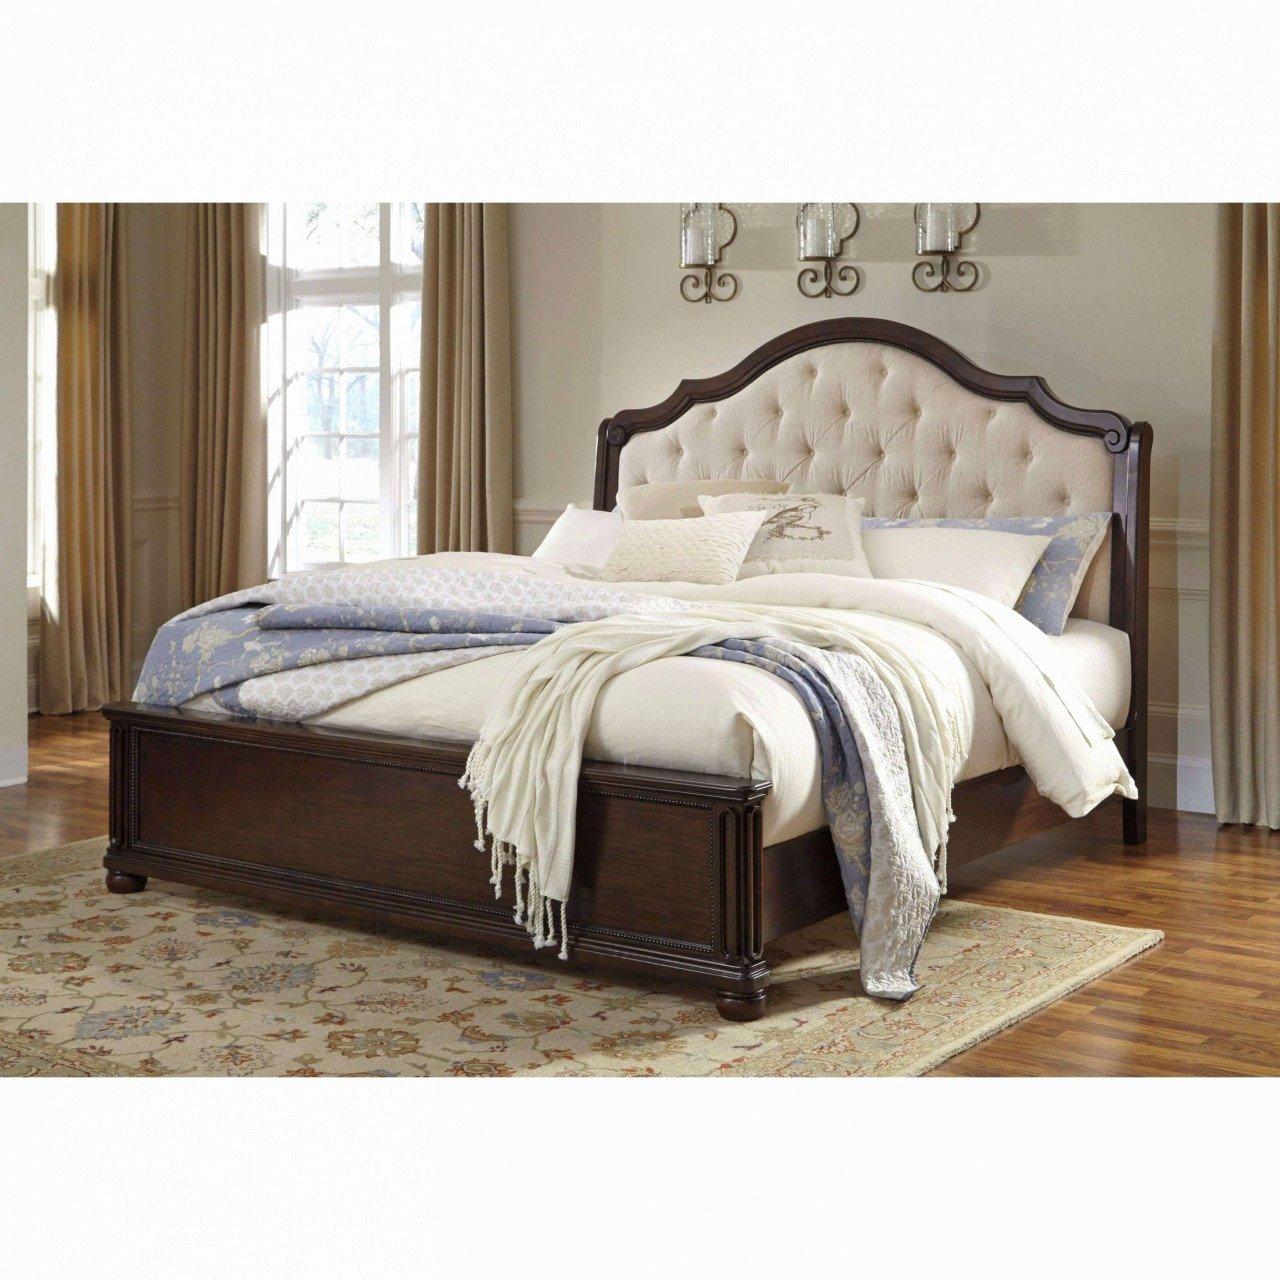 California King Bedroom Set Awesome Cal King Bedroom Sets — Procura Home Blog